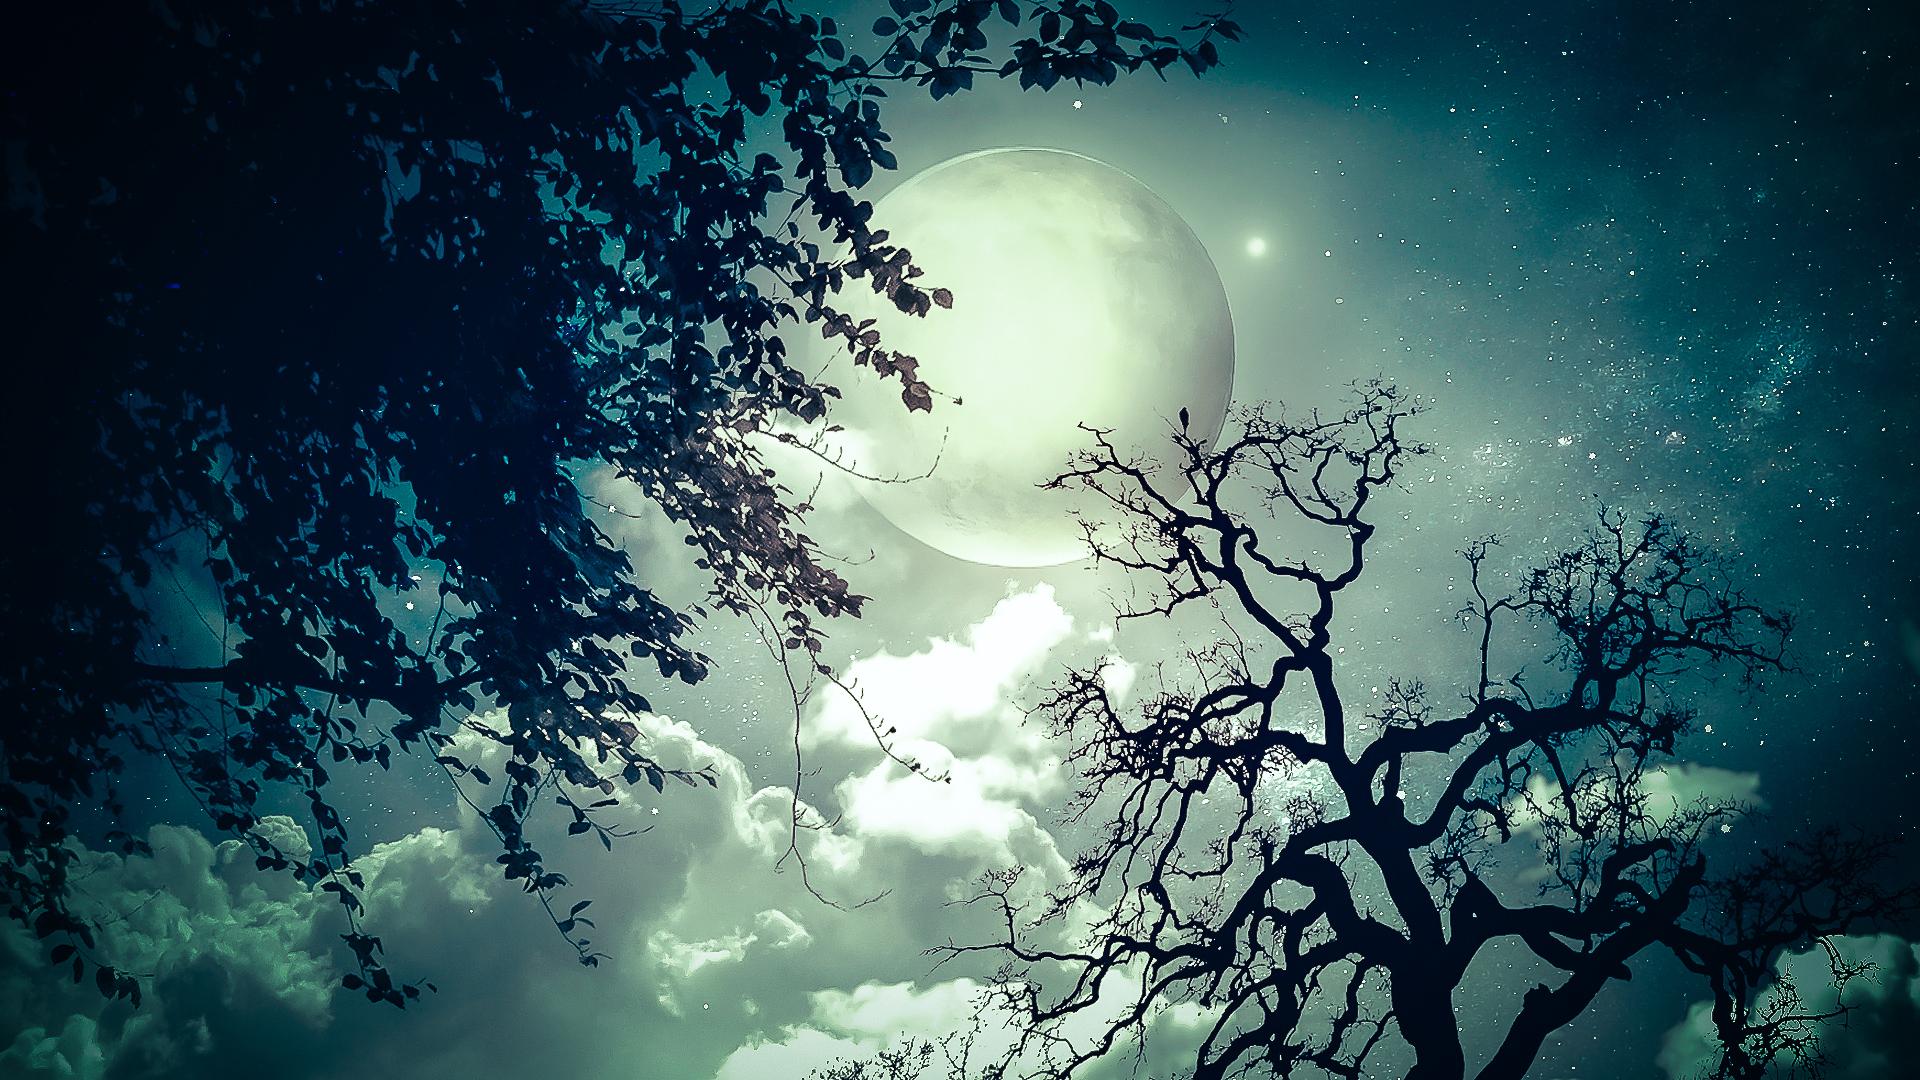 замок ночь небо луна бесплатно